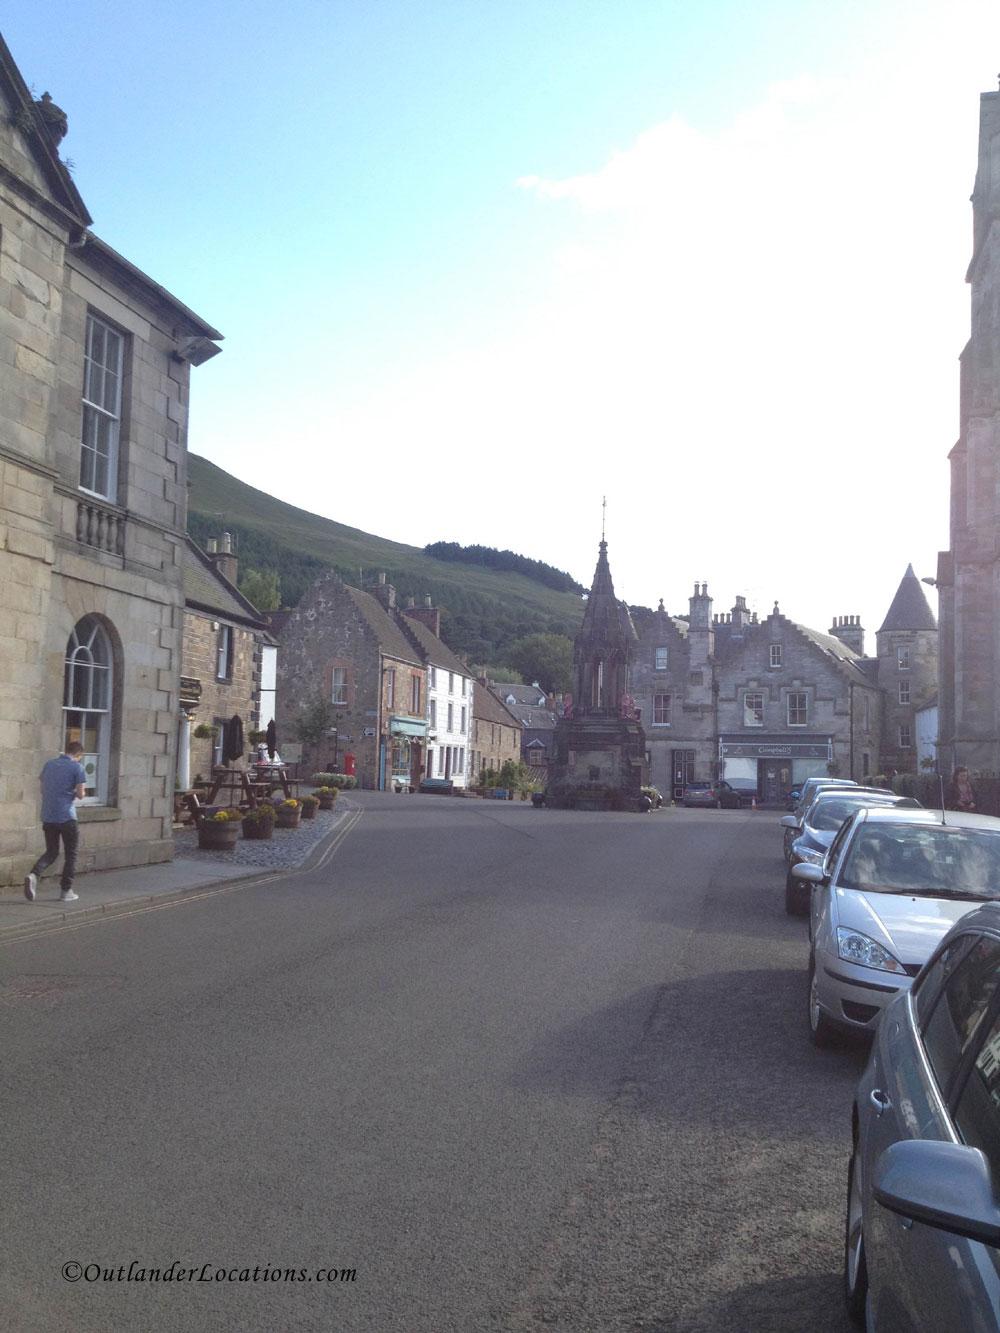 Falkland Main Street